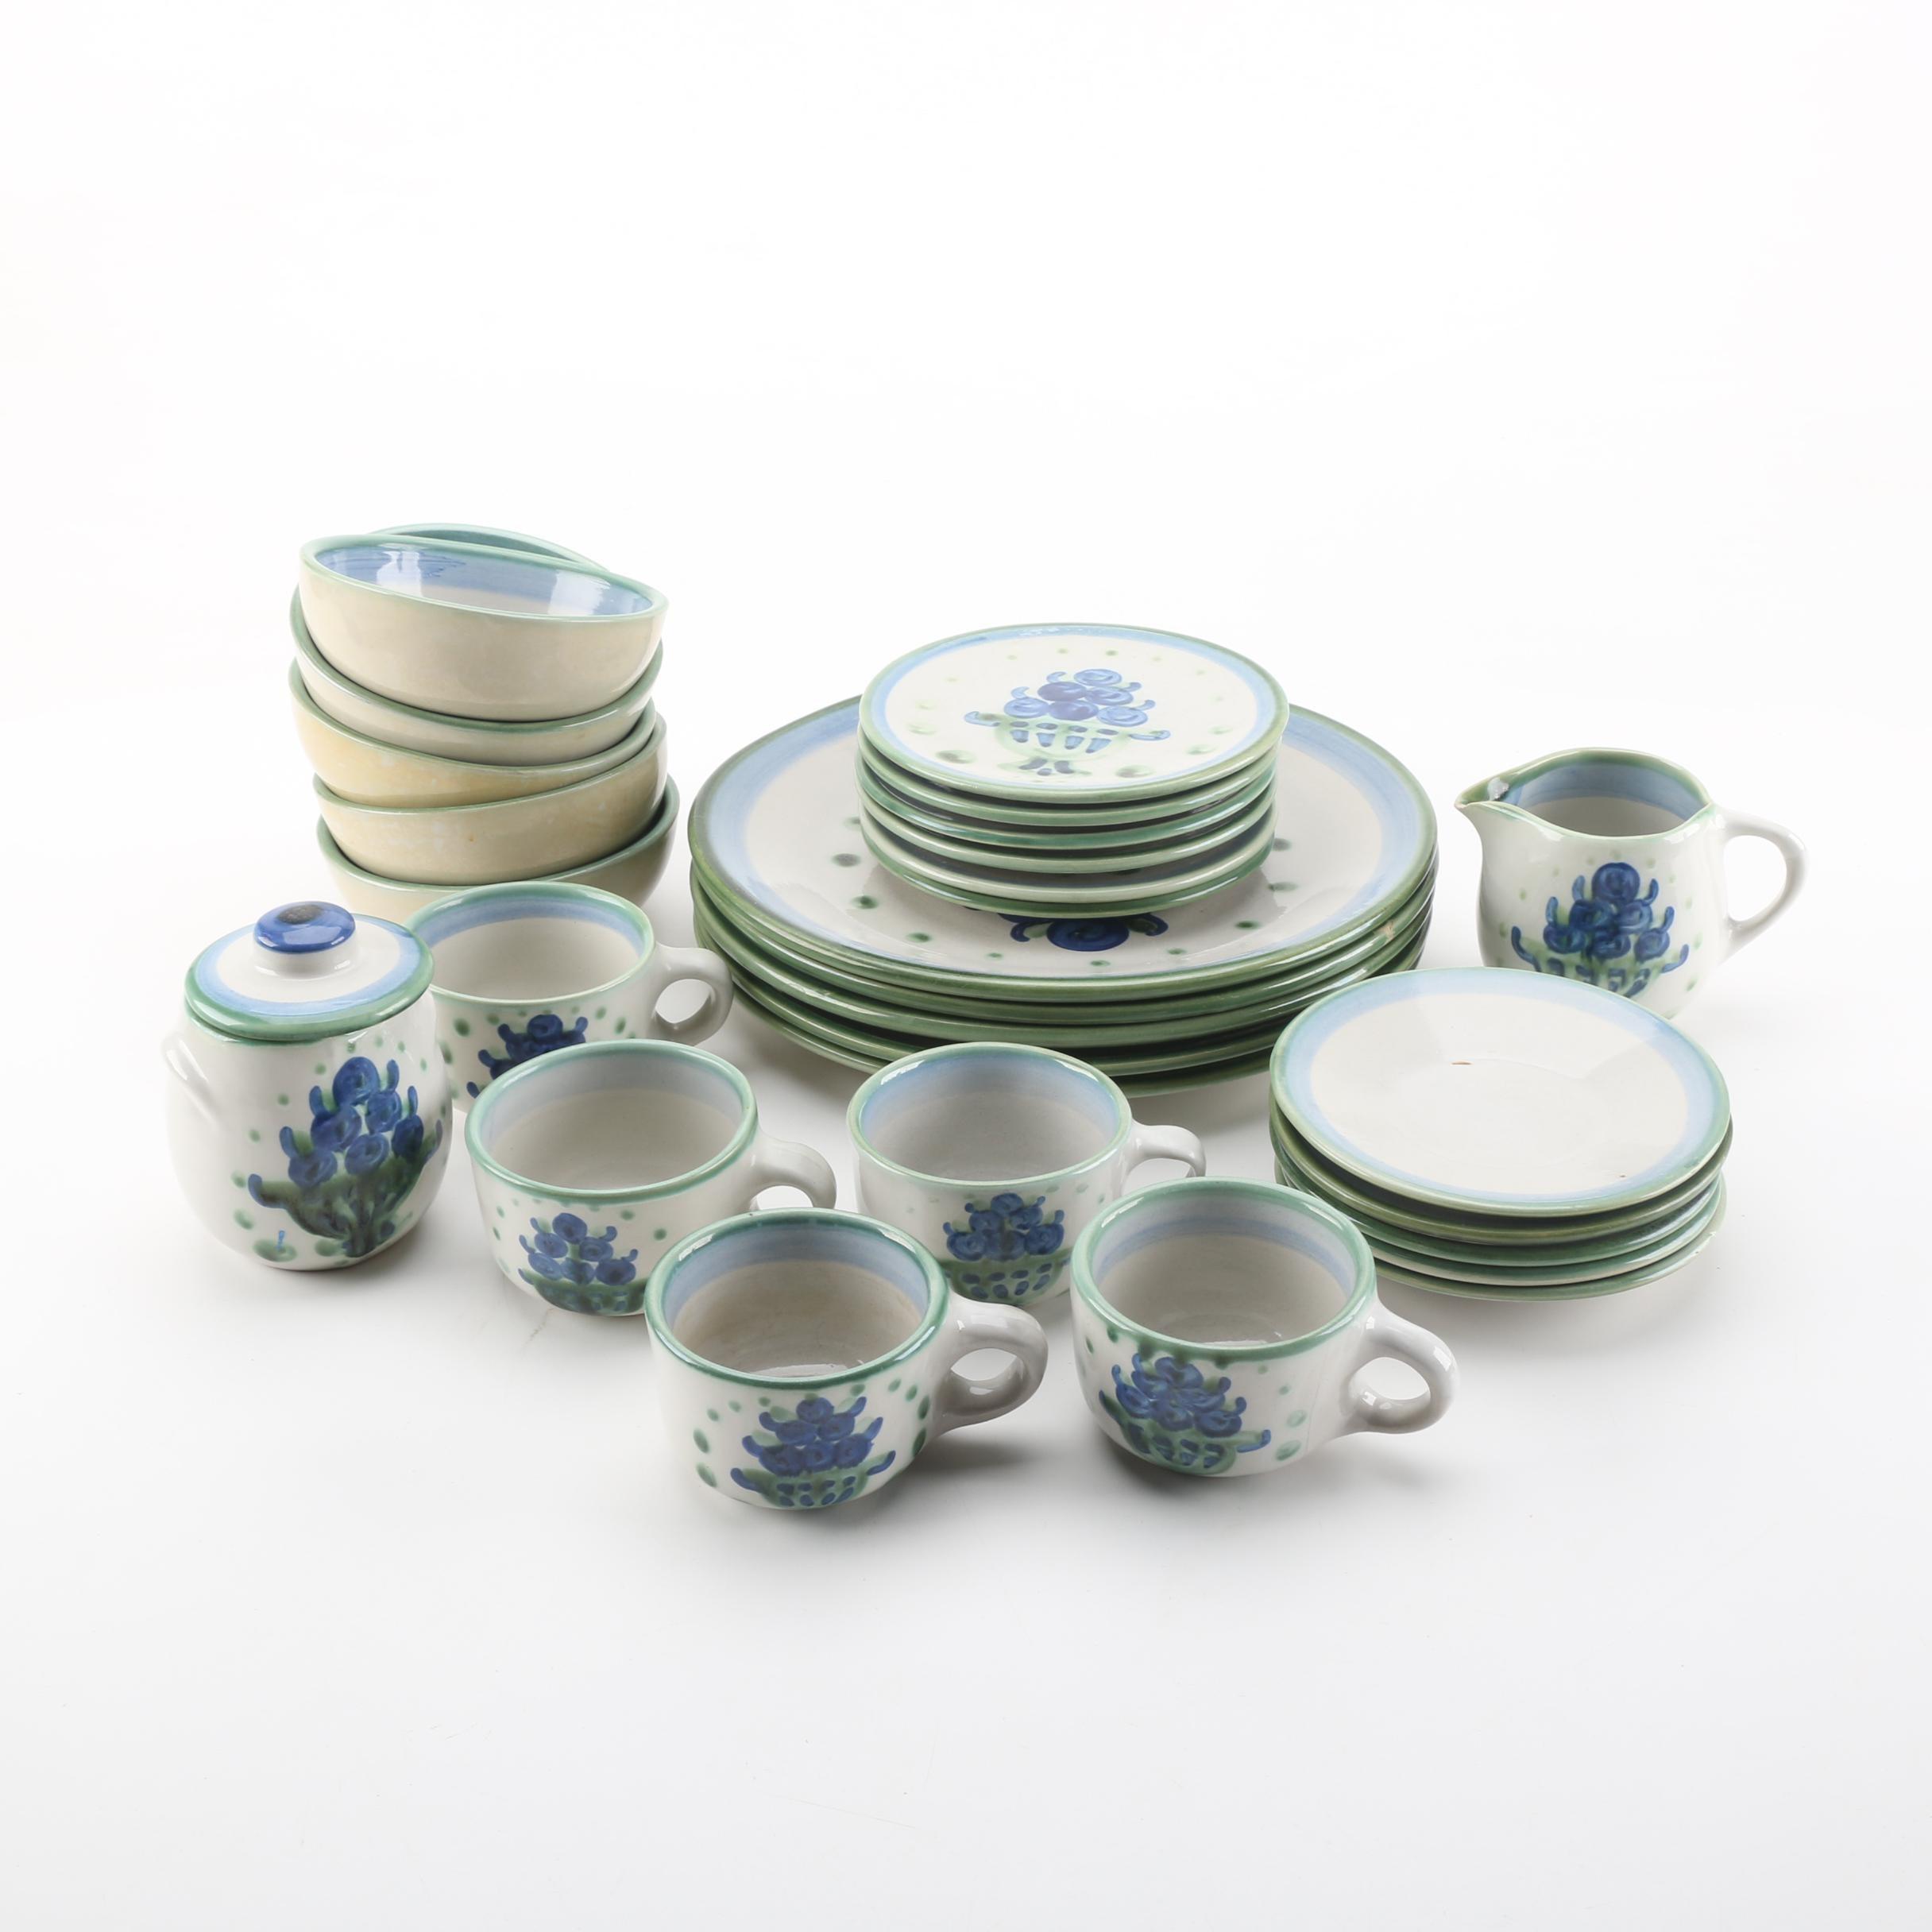 M.A. Hadley Dinnerware Set